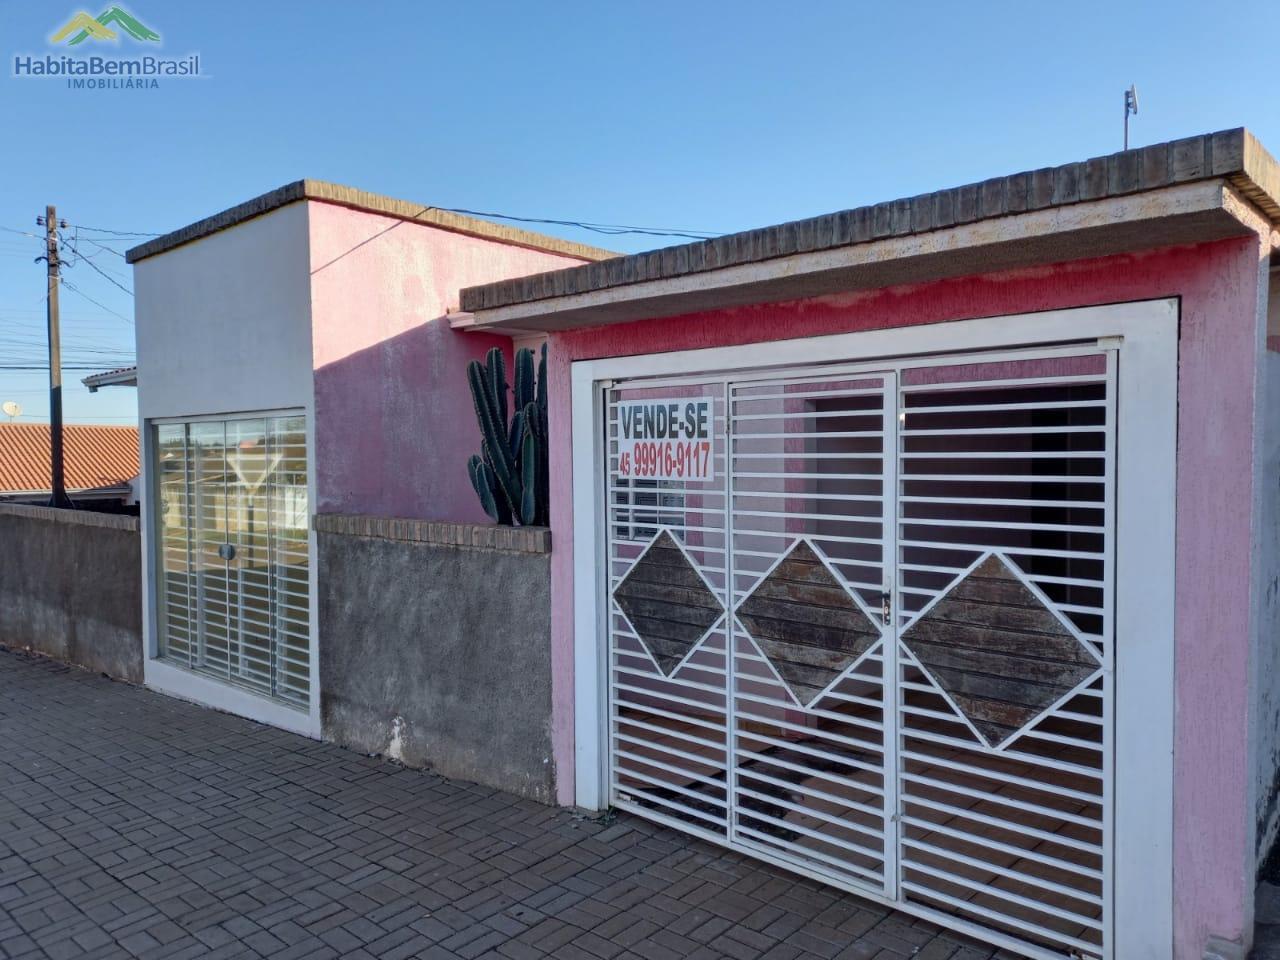 Lote com 7 dormitórios à venda, JARDIM PANORAMA, TOLEDO - PR